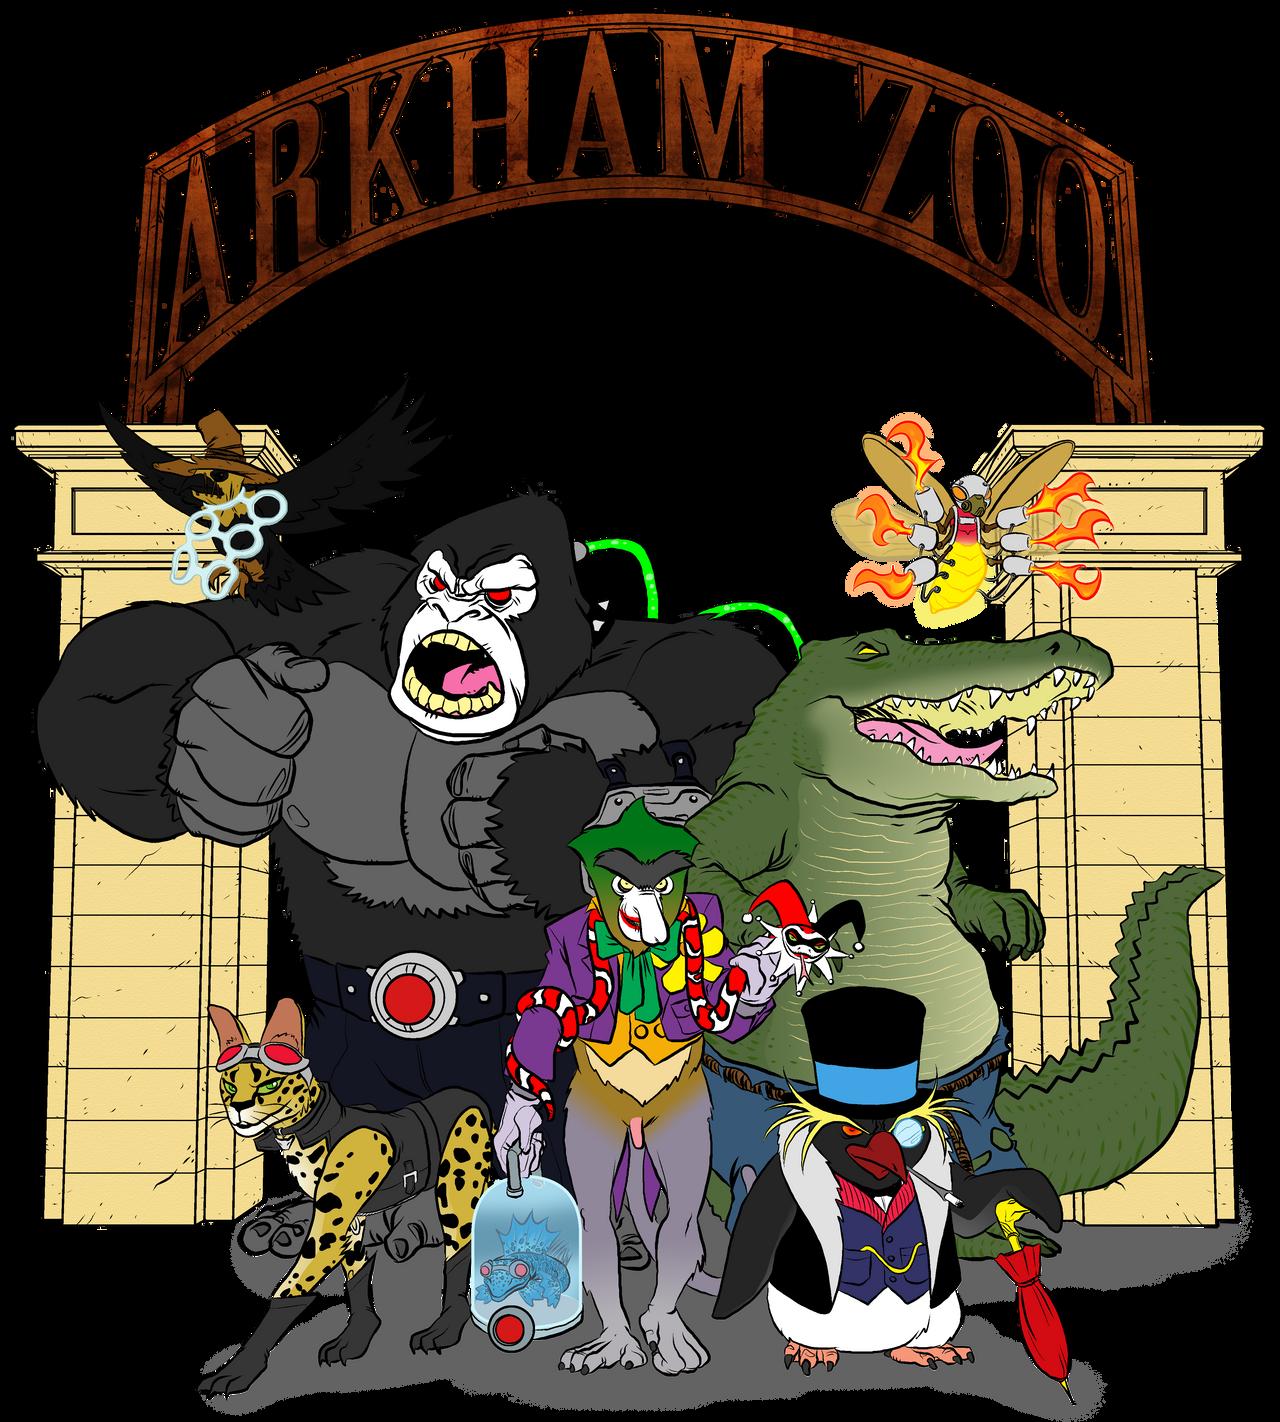 Arkham Zoo Skratch Jam by BloodySamoan